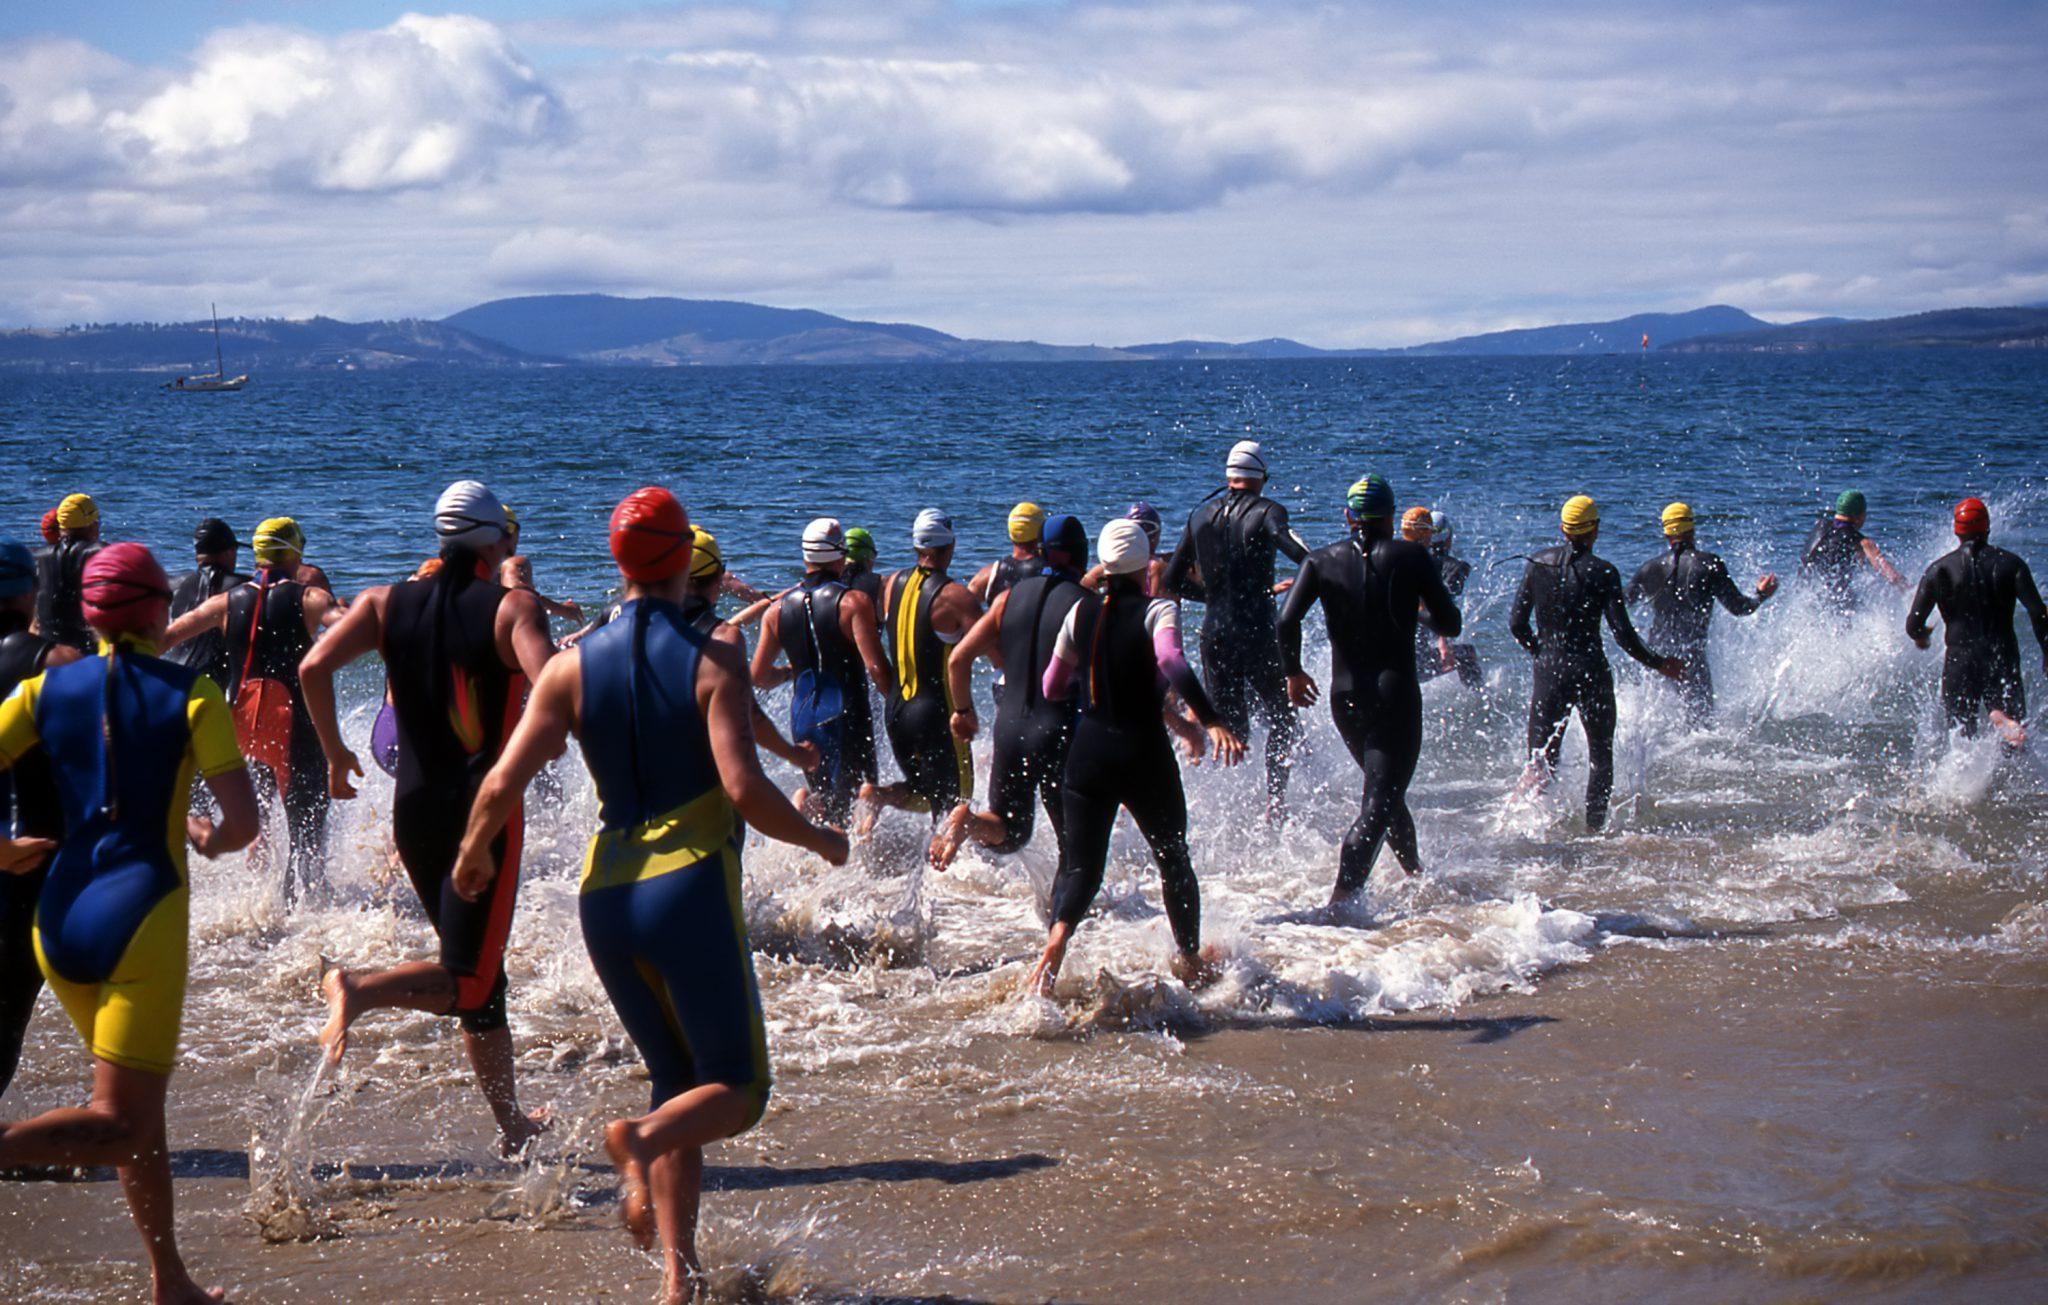 triatlon, running into water